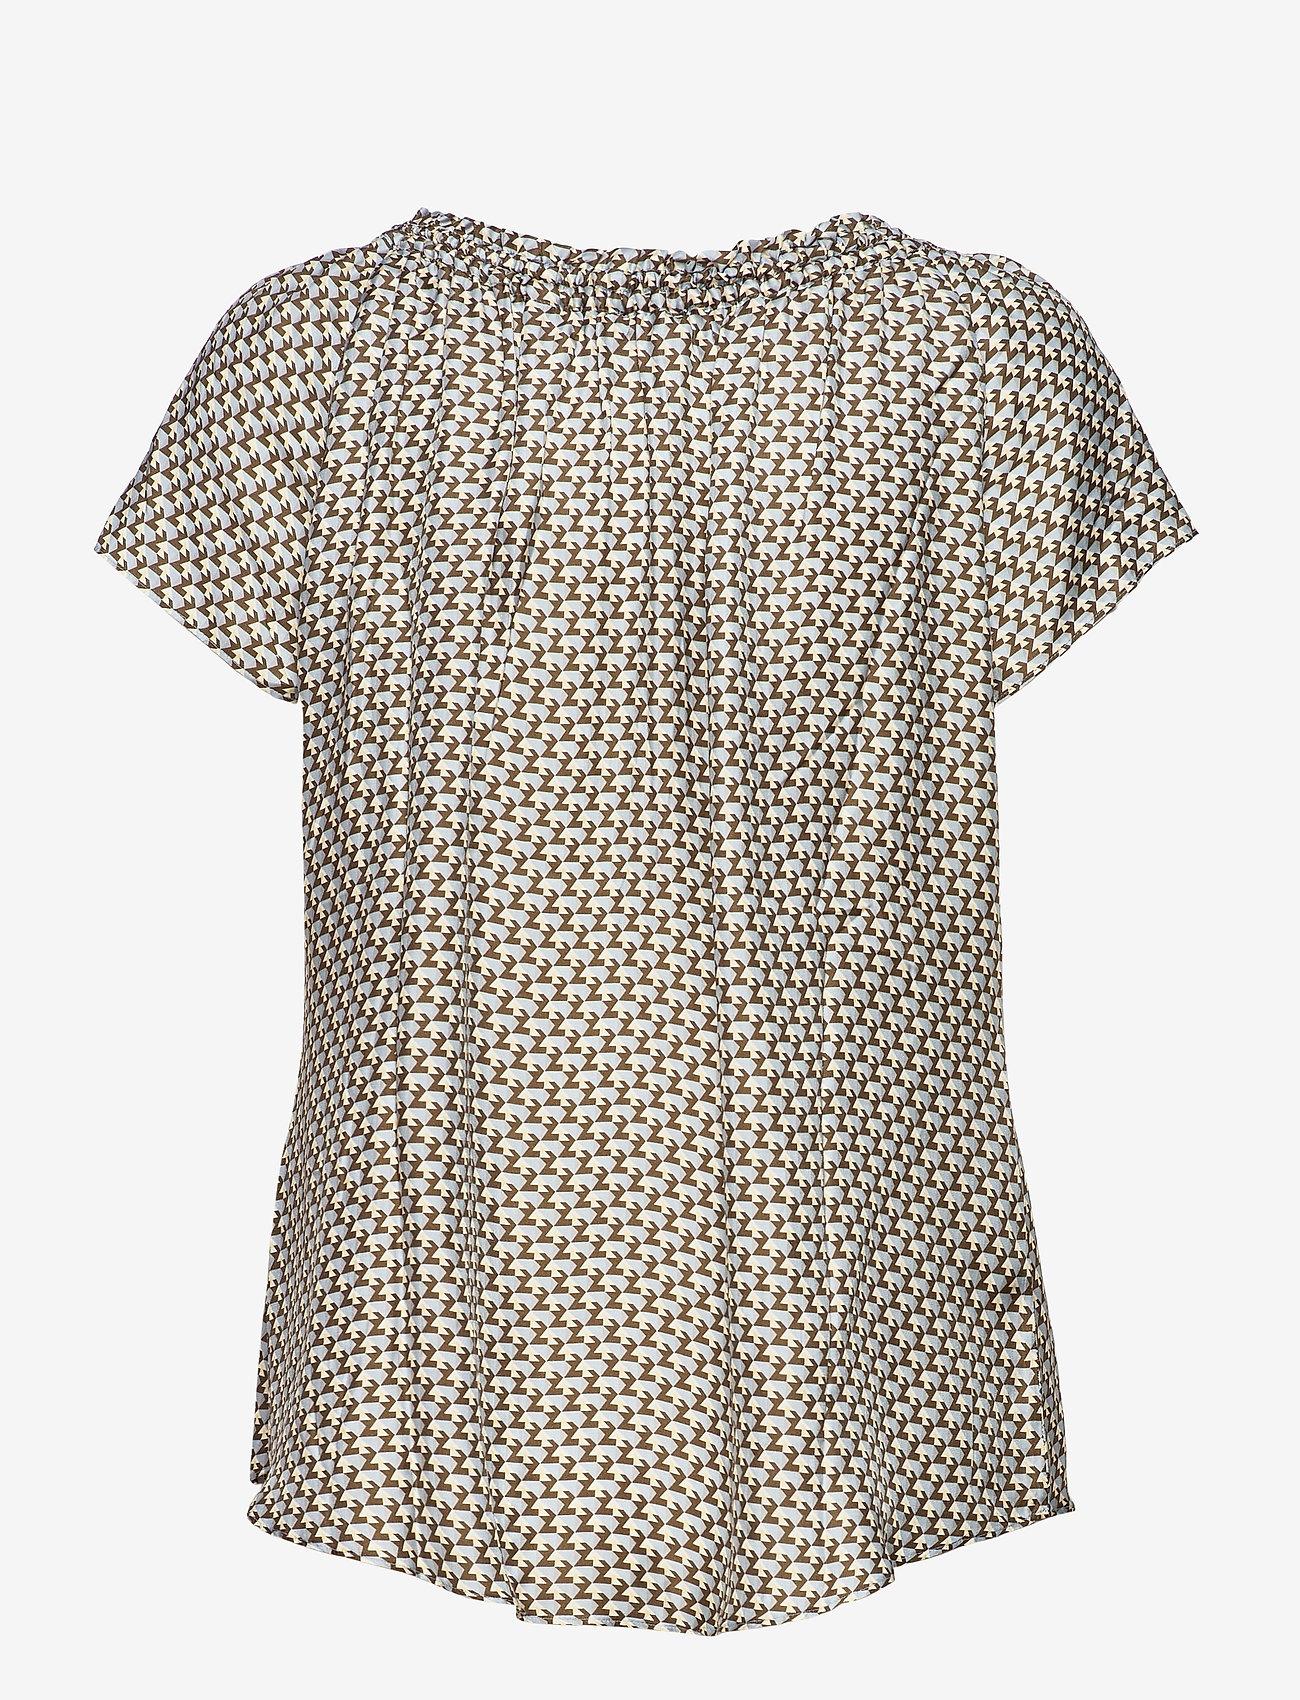 SAND - 3437 - Astride Top - blouses met korte mouwen - blue - 1